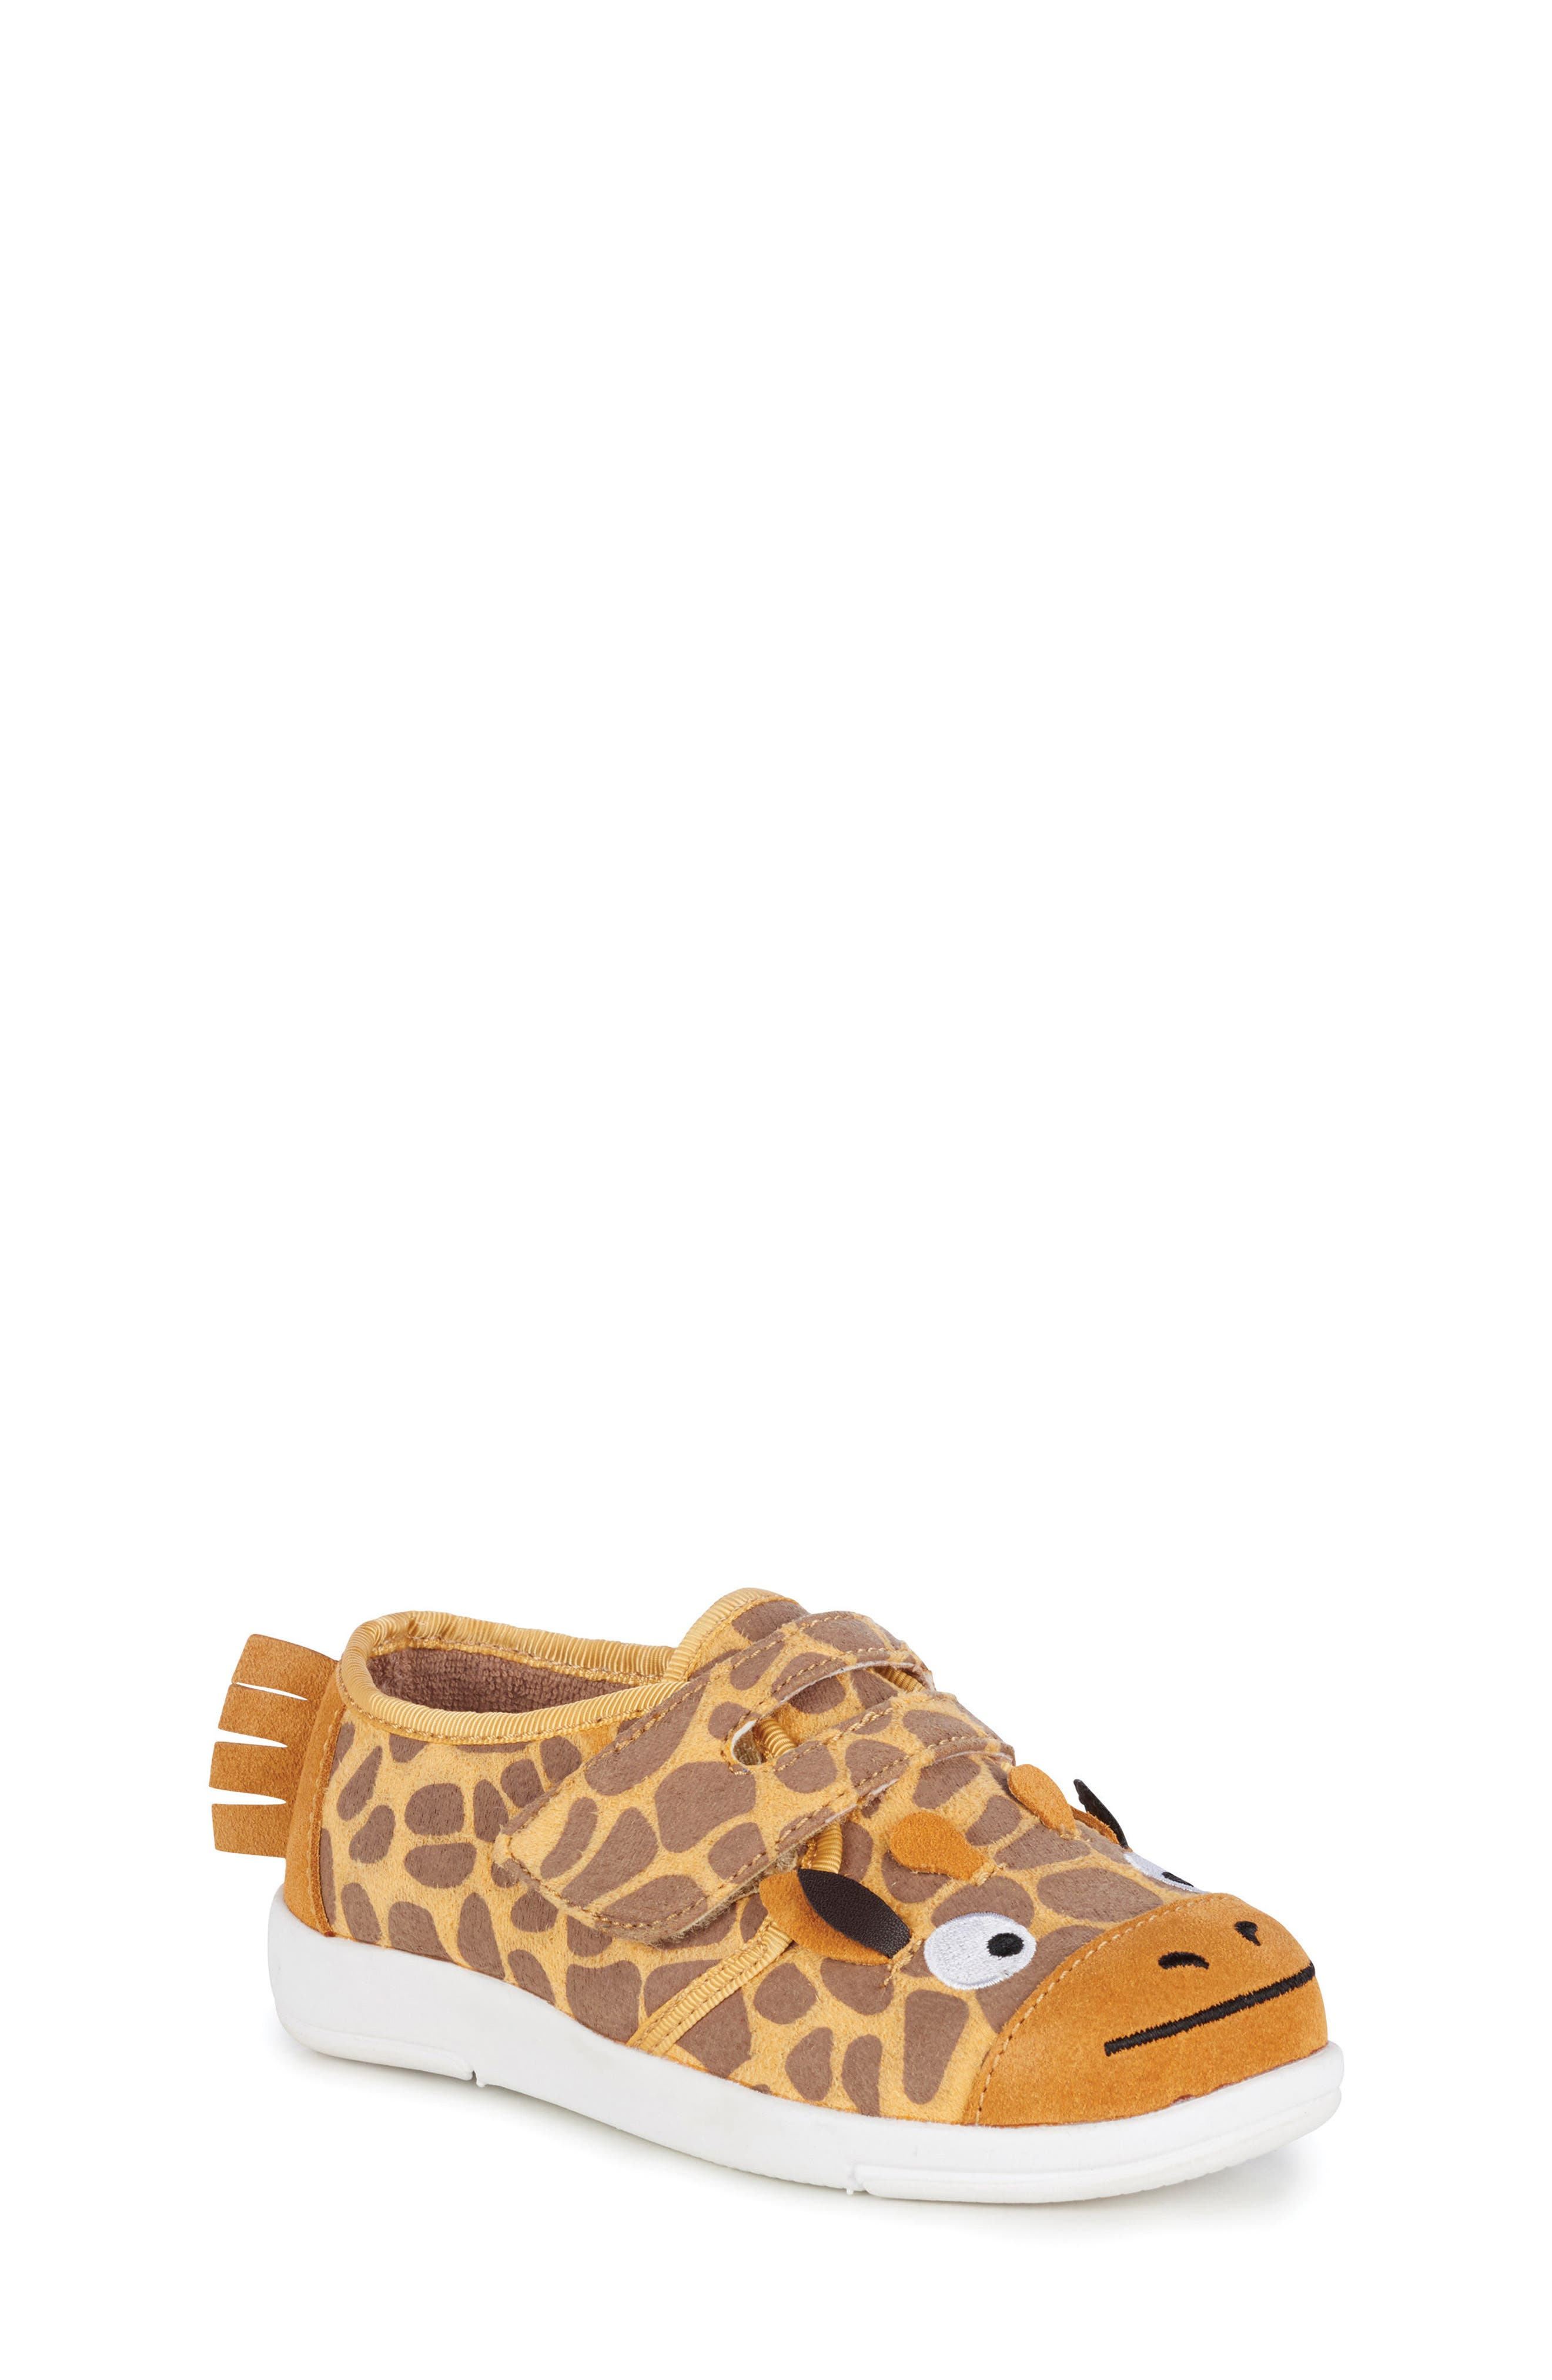 Giraffe Sneaker,                         Main,                         color, 700